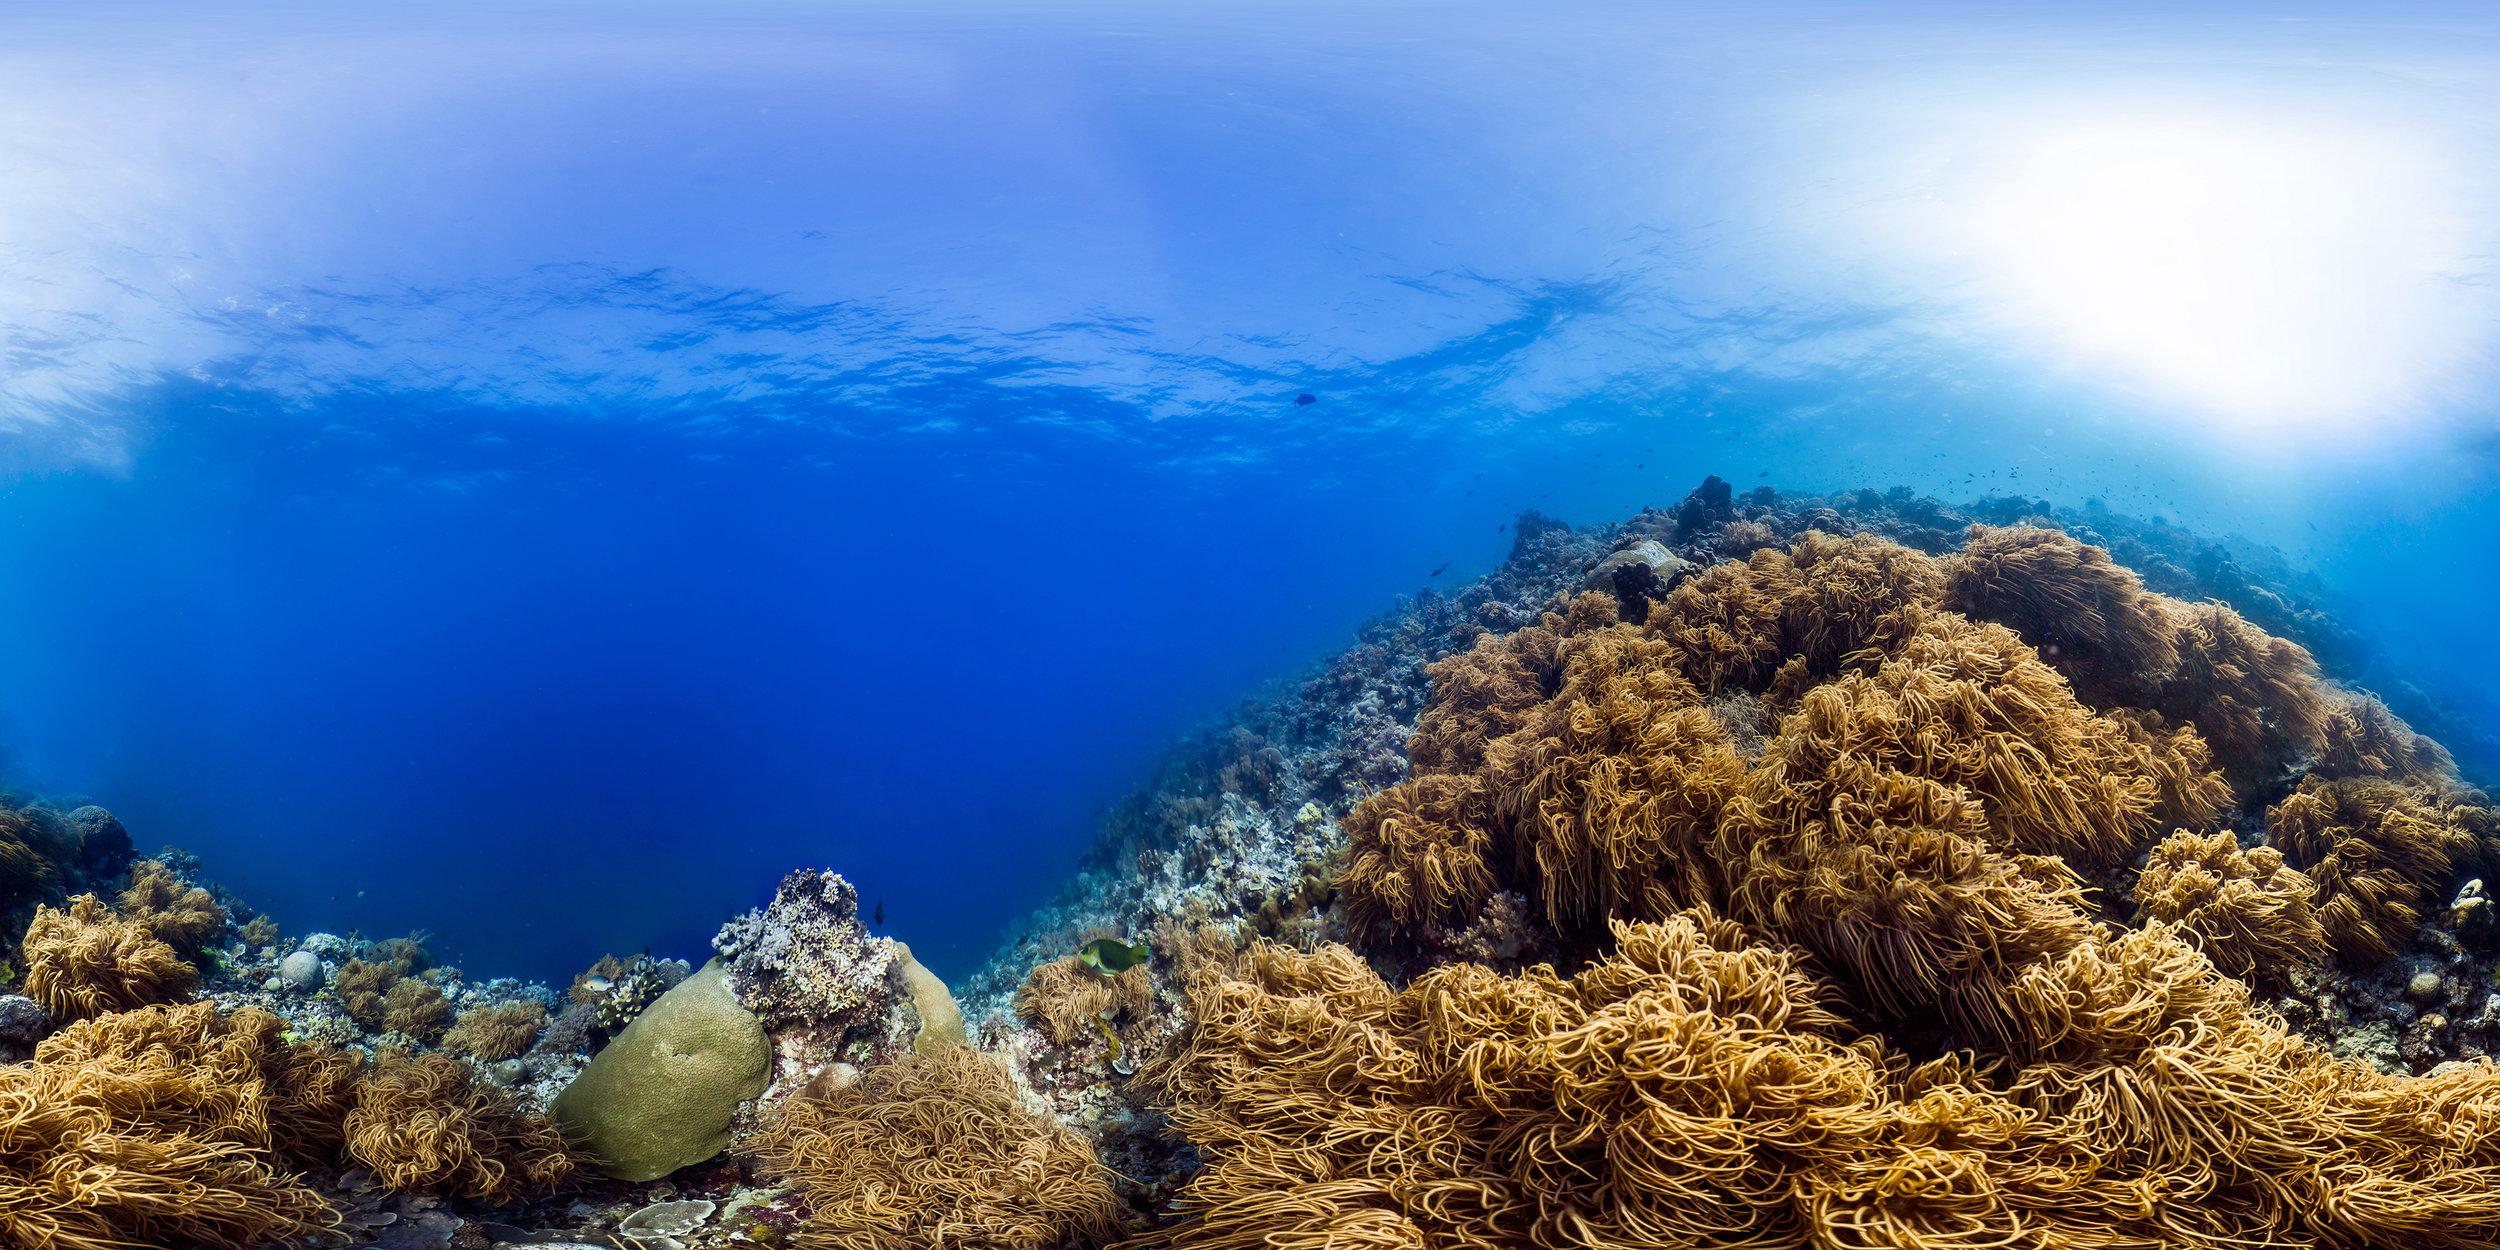 TUBBATAHA REEF, PHILIPPINES CREDIT: THE OCEAN AGENCY / XL CATLIN SEAVIEW SURVEY